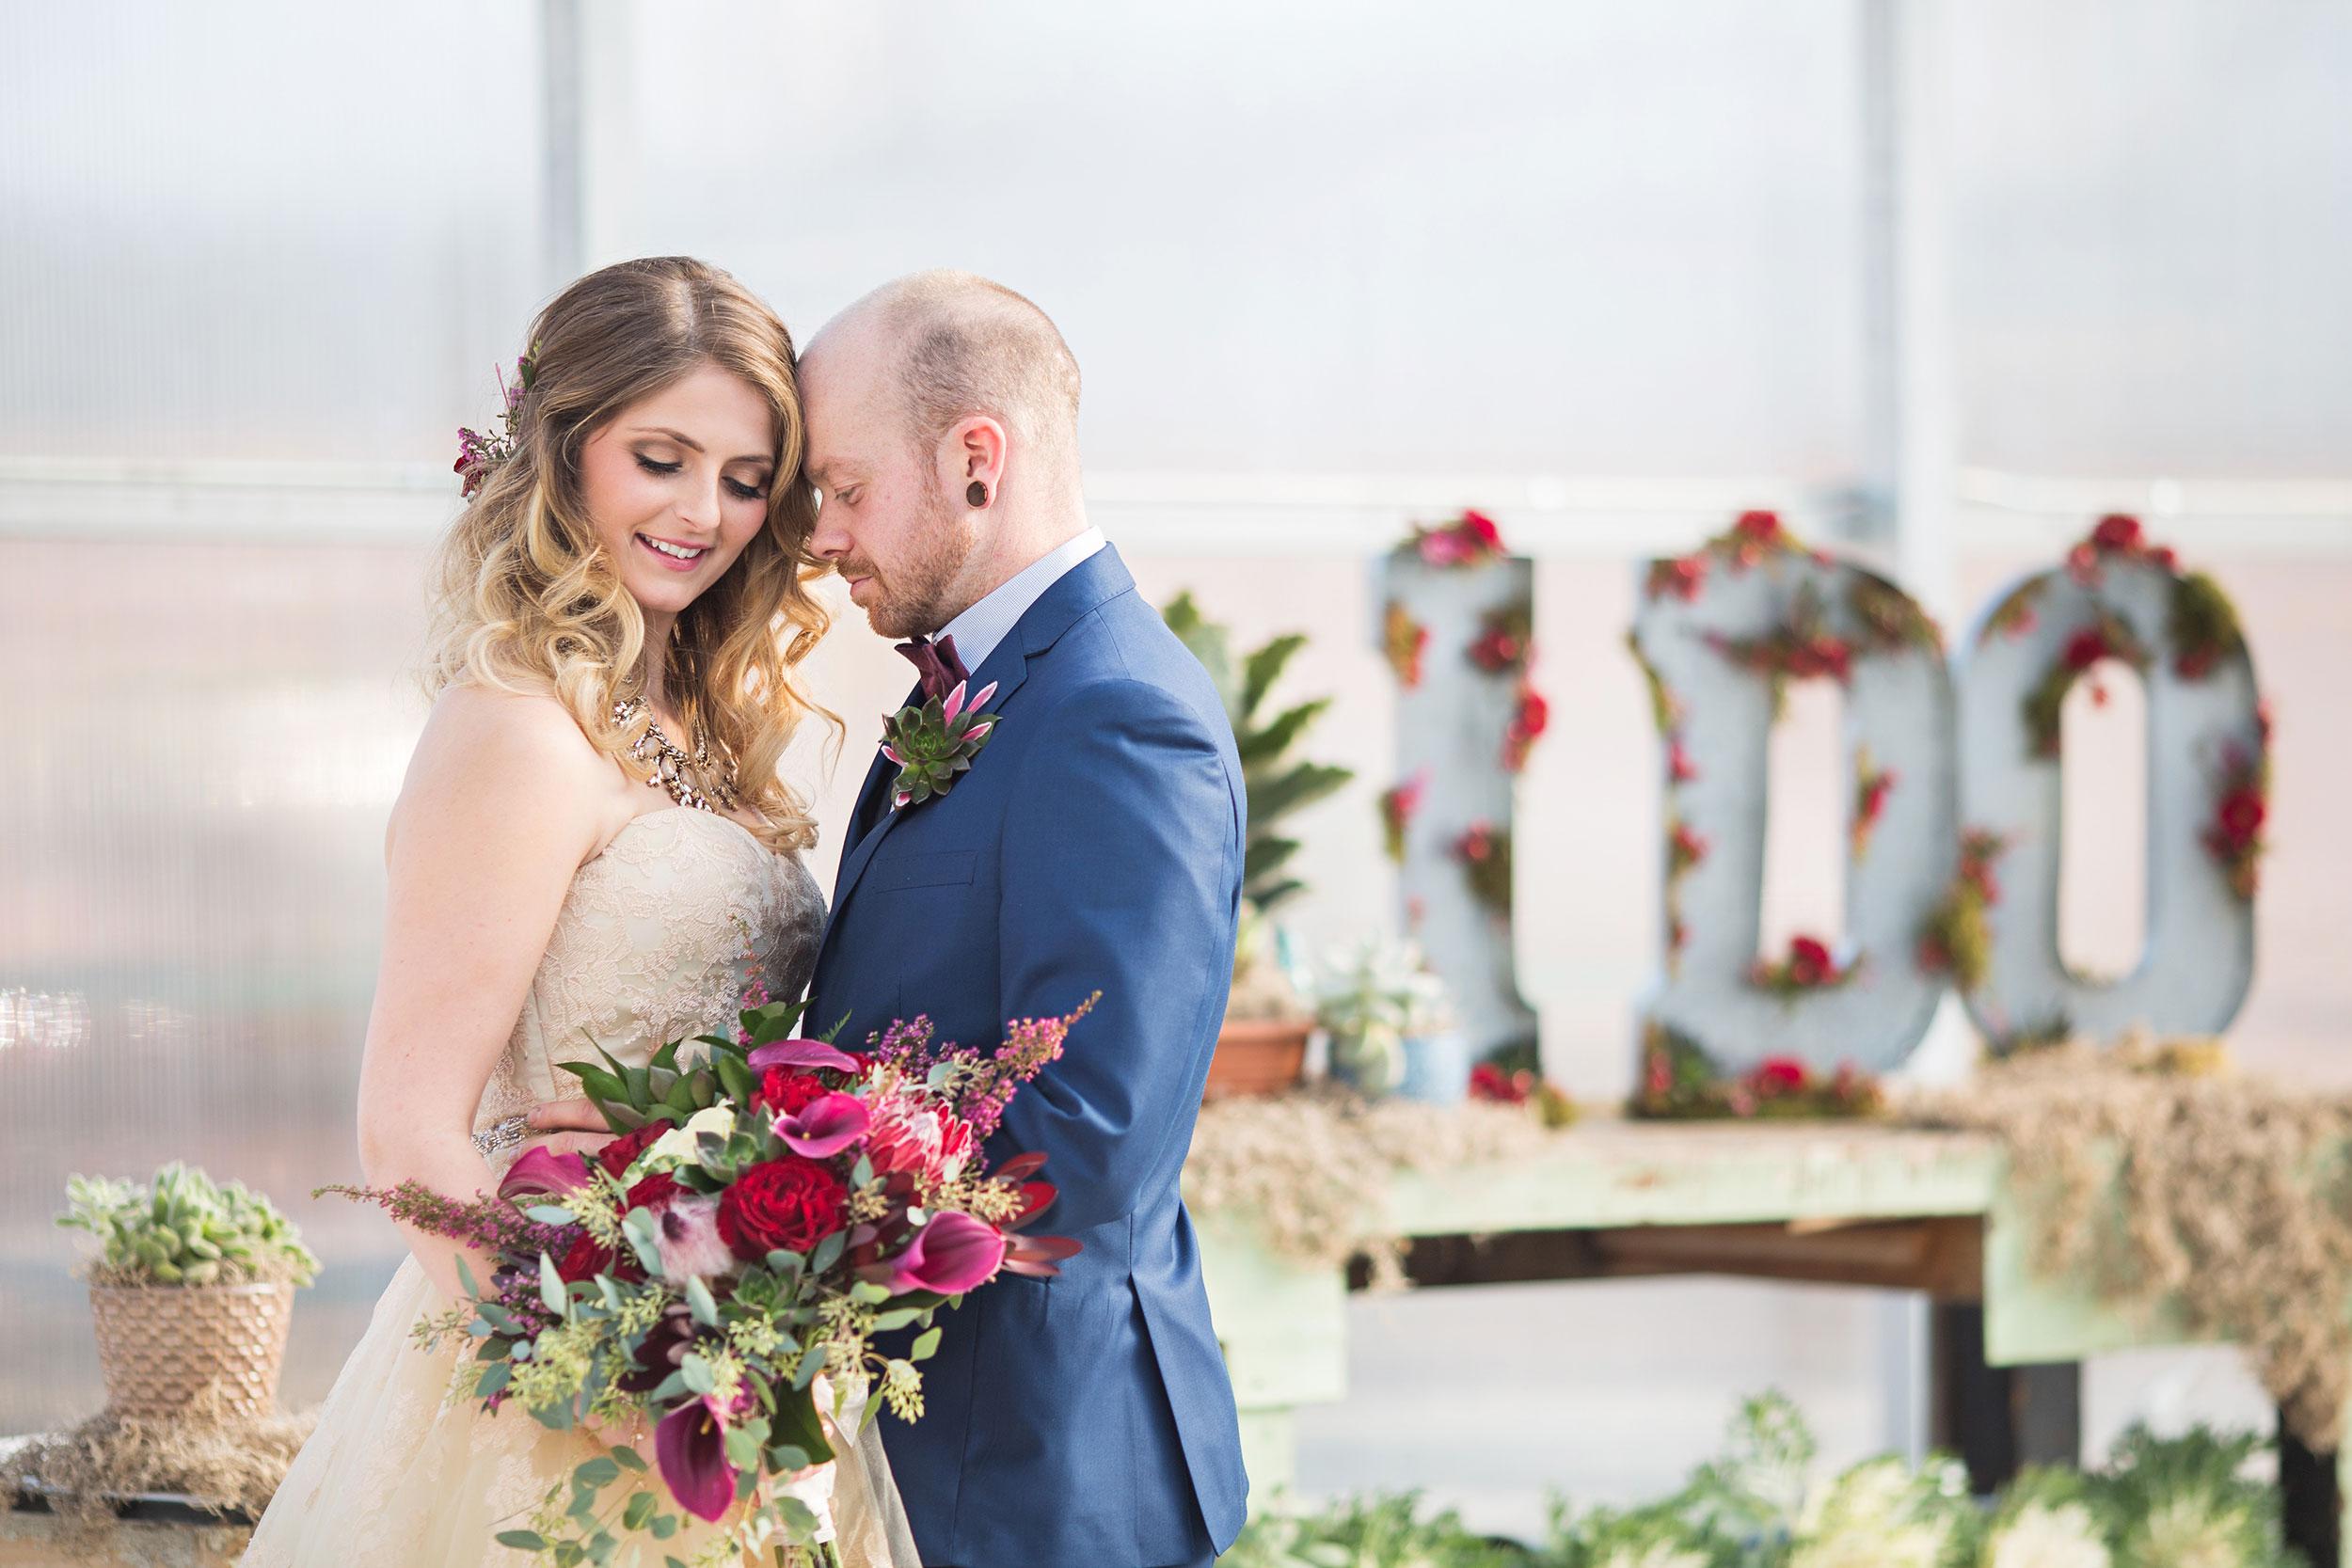 windsor-ontario-wedding-photographer-botanical-wedding-toronto-weddingbells-magazine-eryn-shea-photography-01.jpg